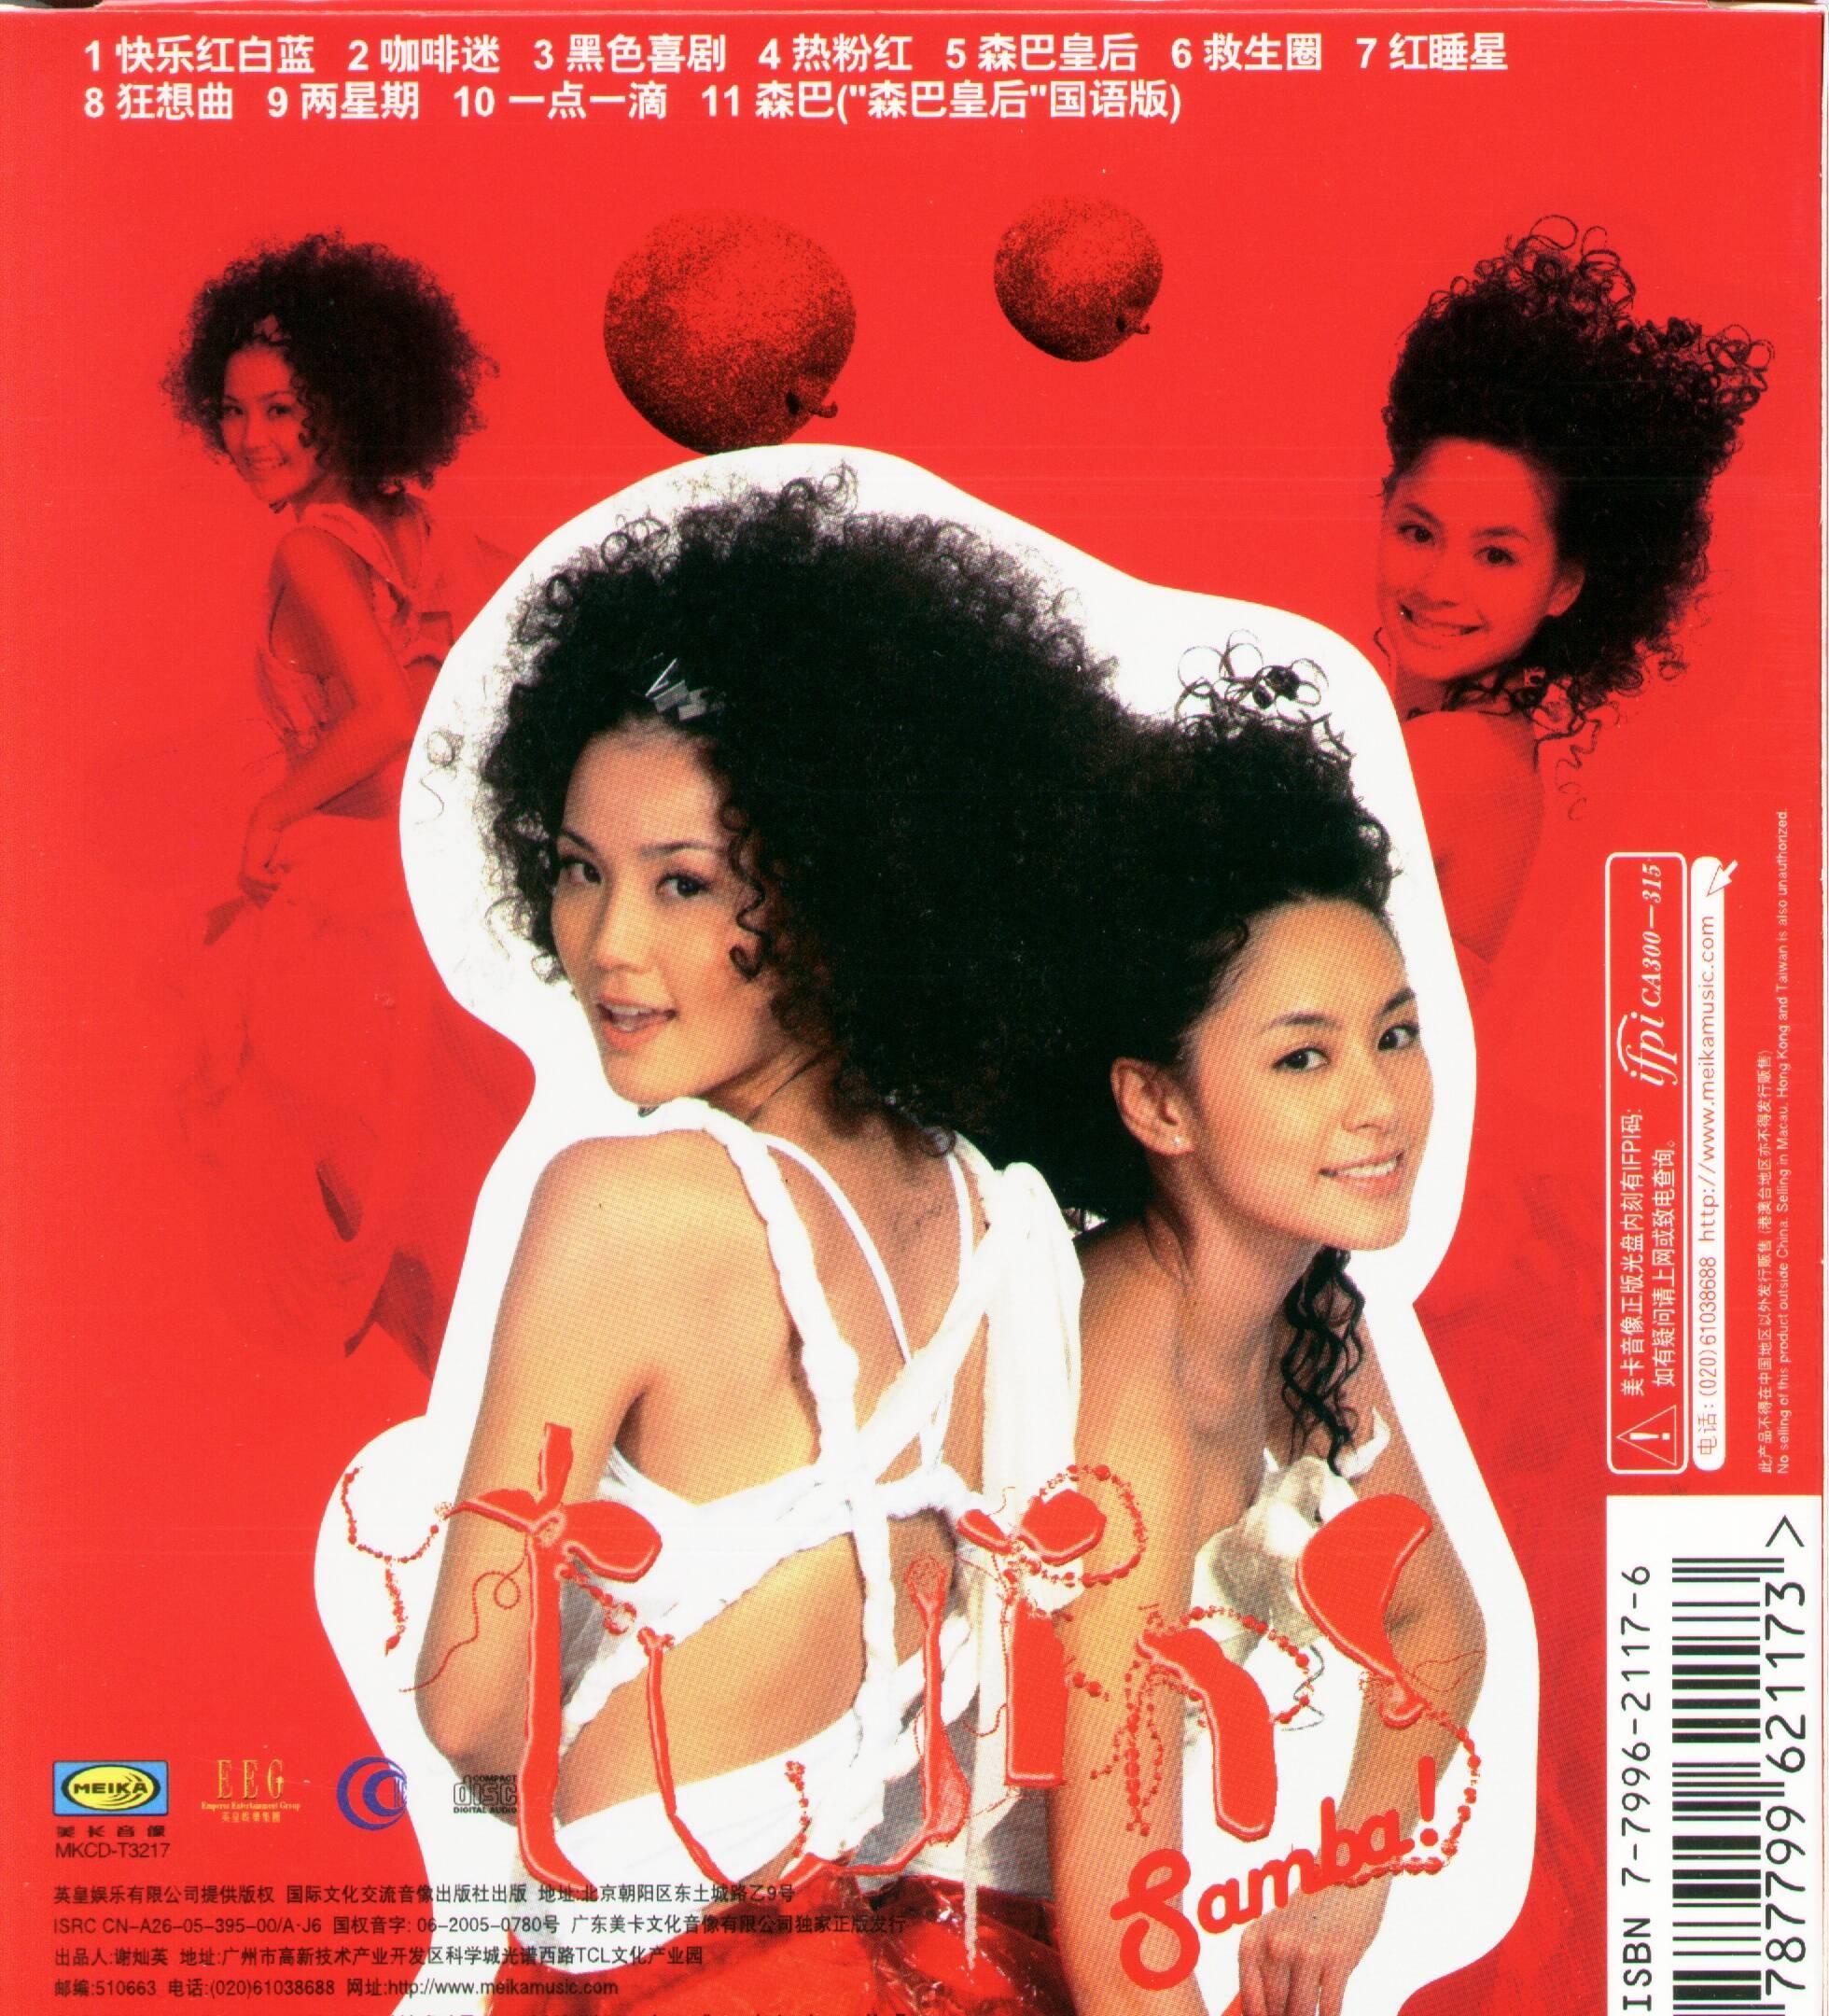 Twins – Samba 森巴  (2005) [WAV 整軌]